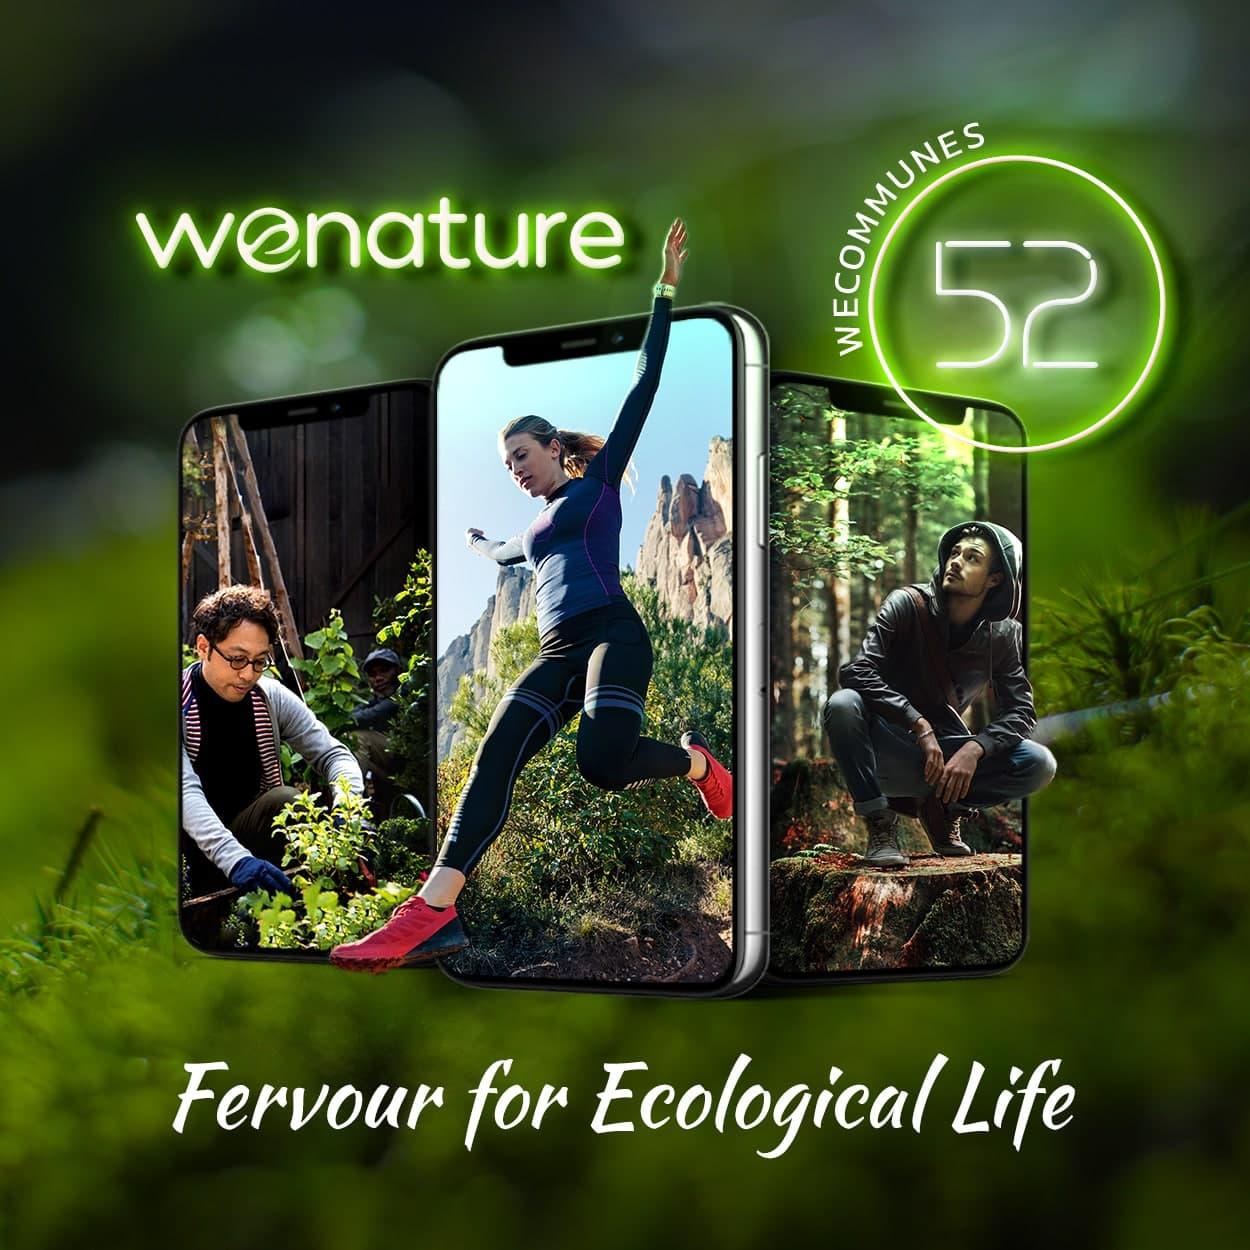 Neo-ecological commune promotes environmental stewardship through 'ecological citizenship'